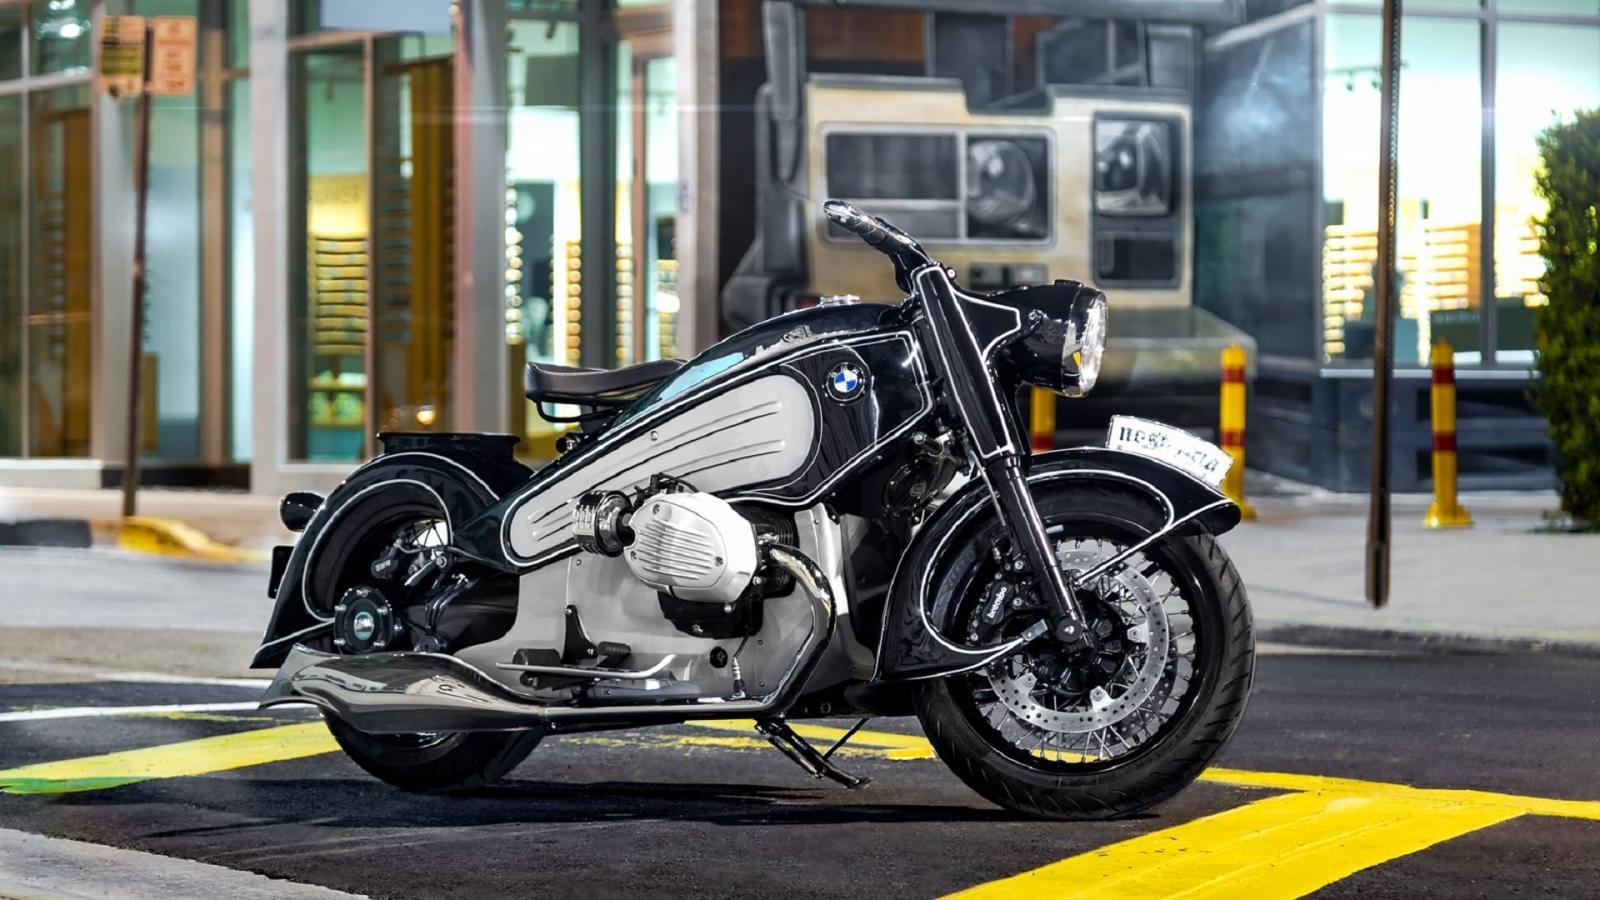 NMoto Nostalgia phát triển dựa trên mẫu BMW R nineT